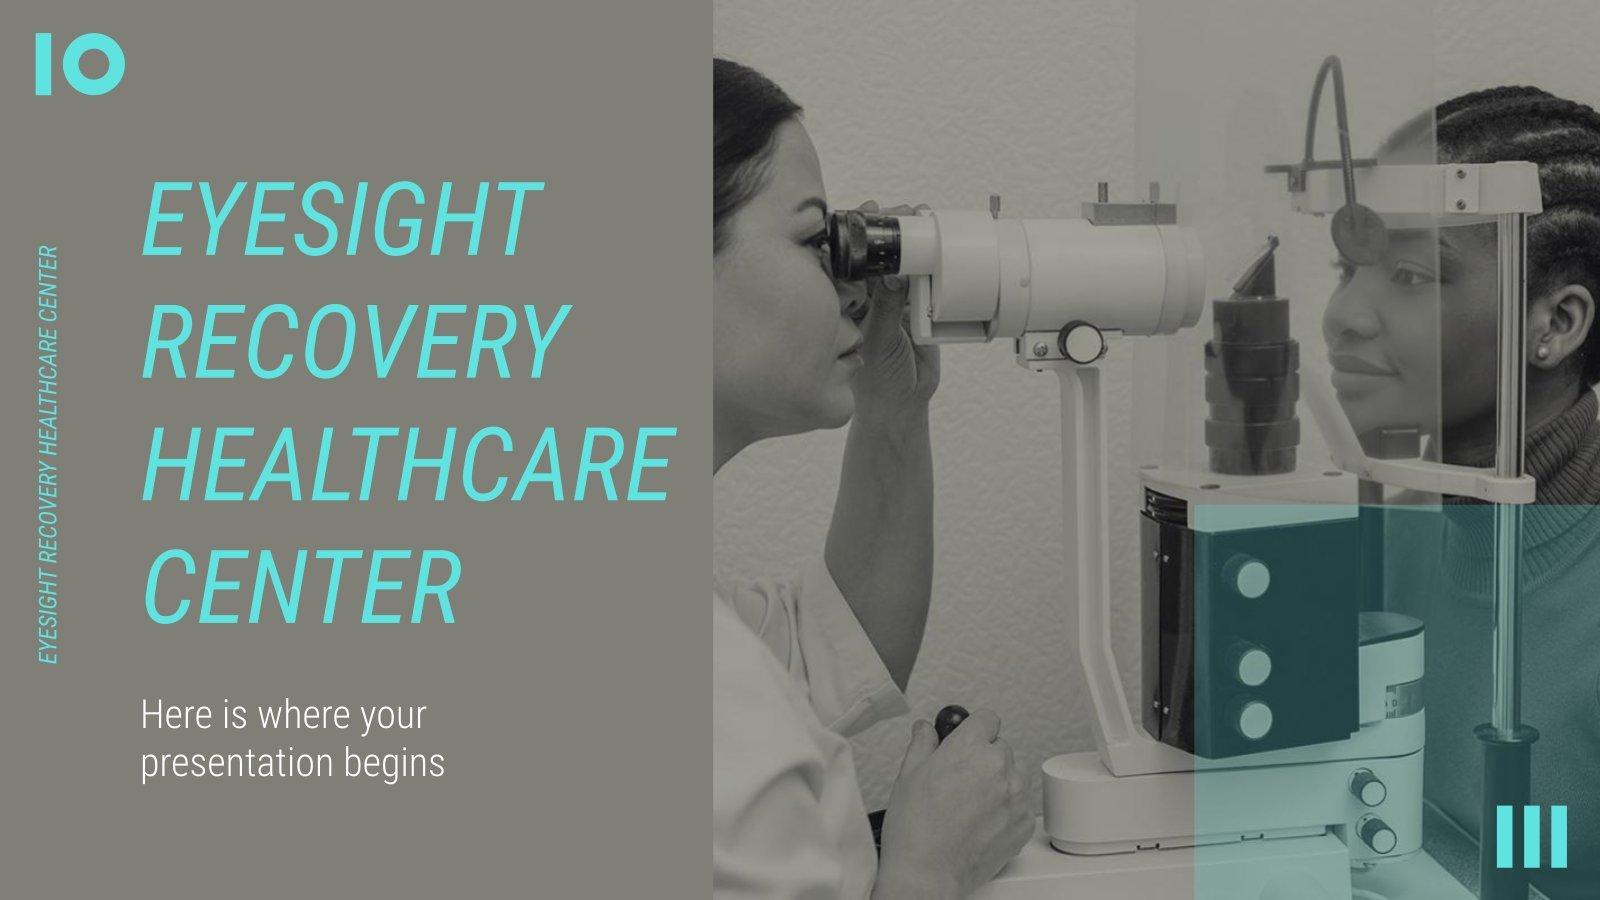 Eyesight Recovery Healthcare Center presentation template